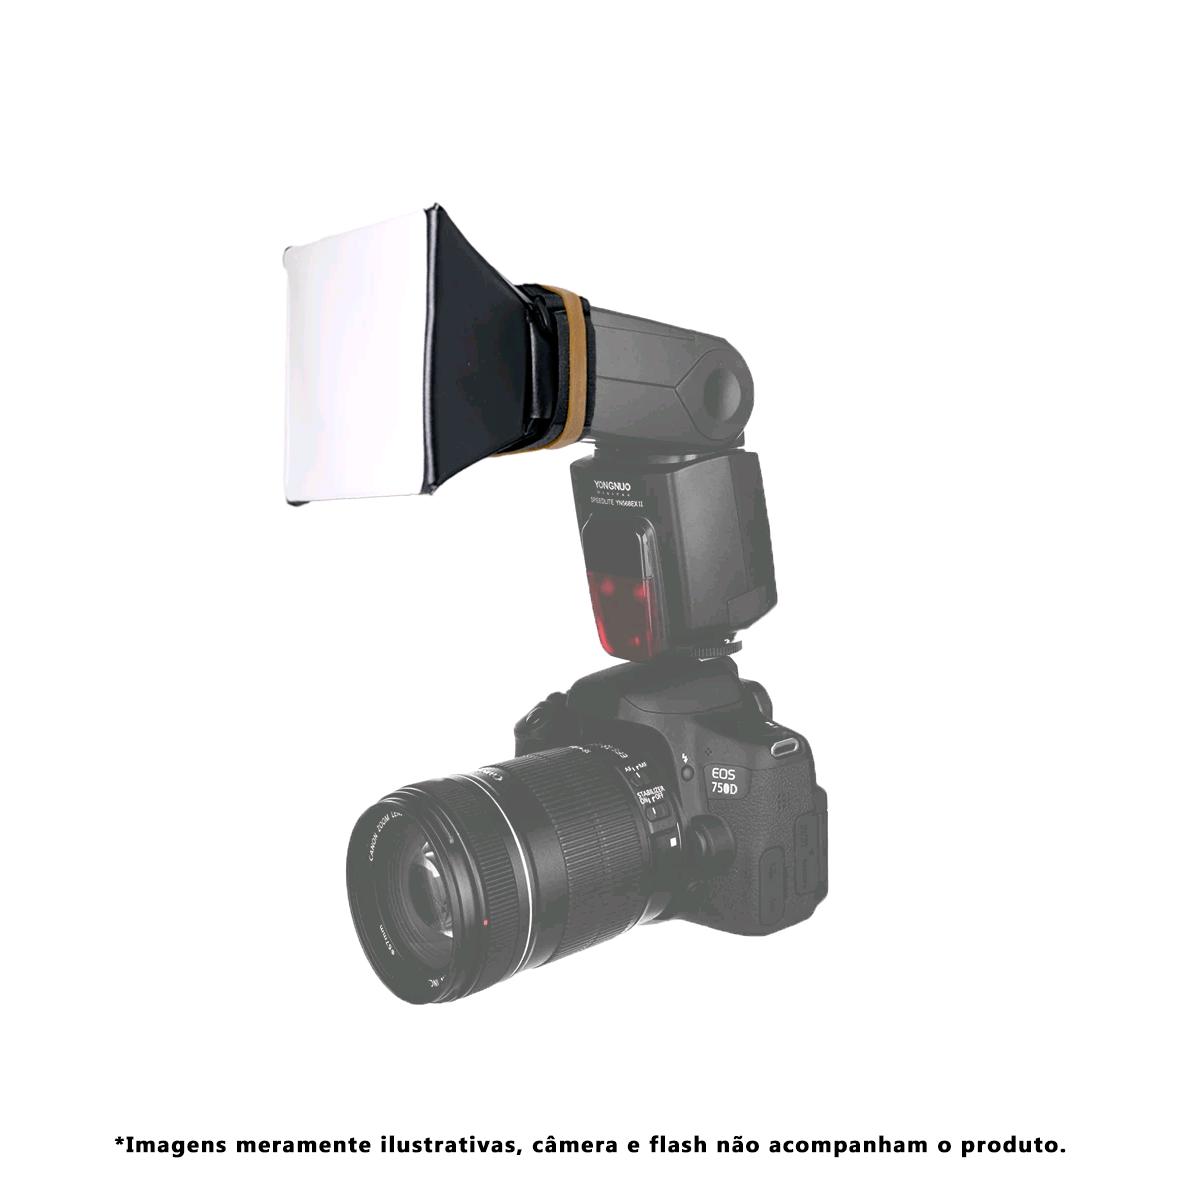 Lote com 5 unidades de Mini Softbox Difusor para Flash Speedlite Sou Foto MSF-001  - Fotolux